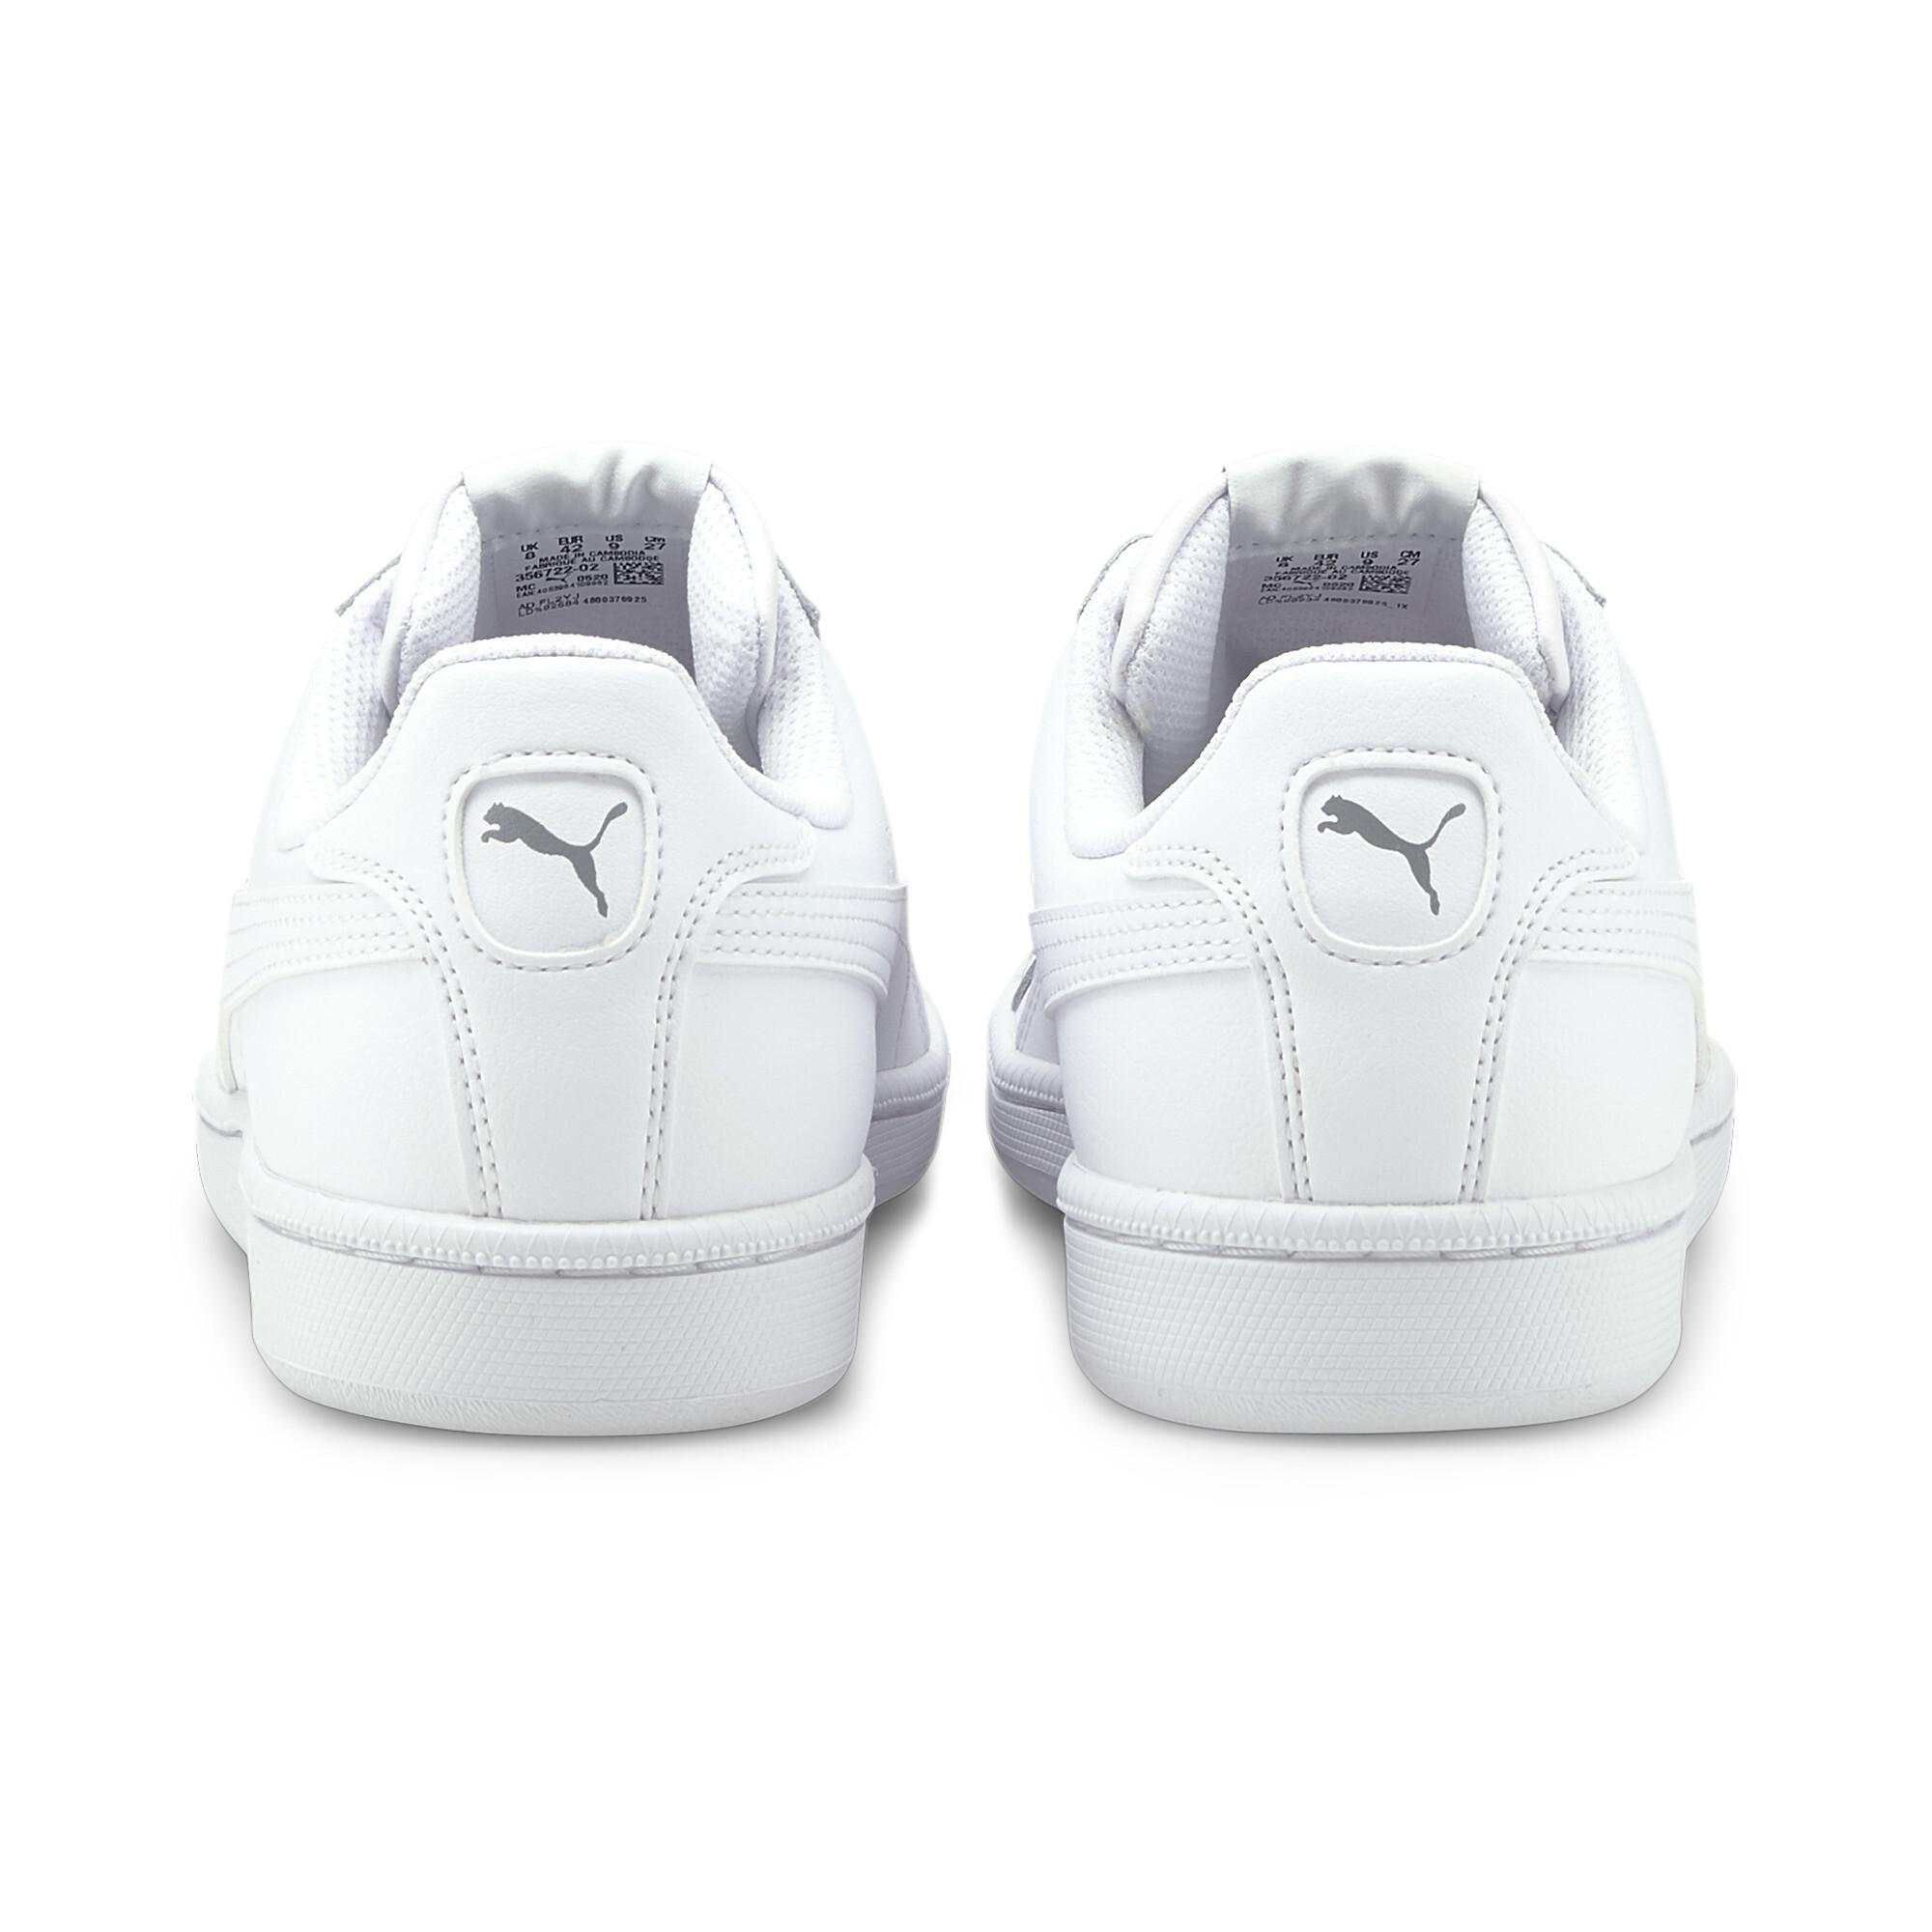 Indexbild 13 - PUMA Smash Trainers Schuhe Sneakers Sport Classics Unisex Neu